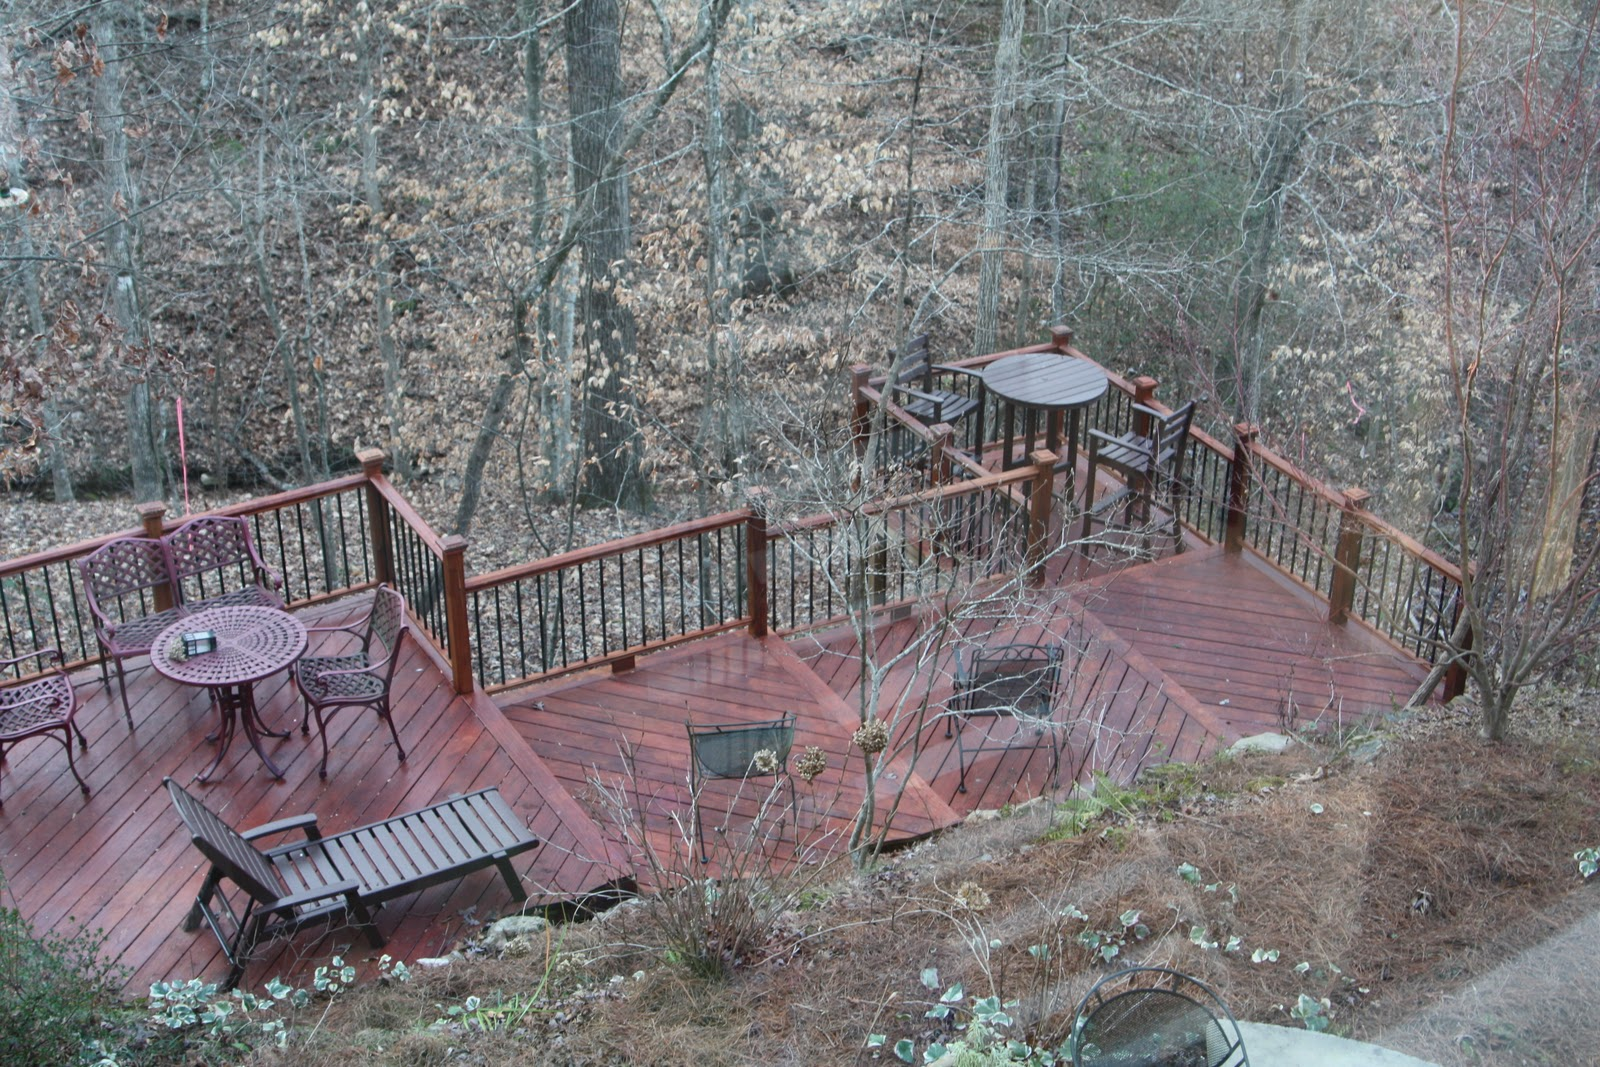 DIY Backyard Deck by #HandyHubby